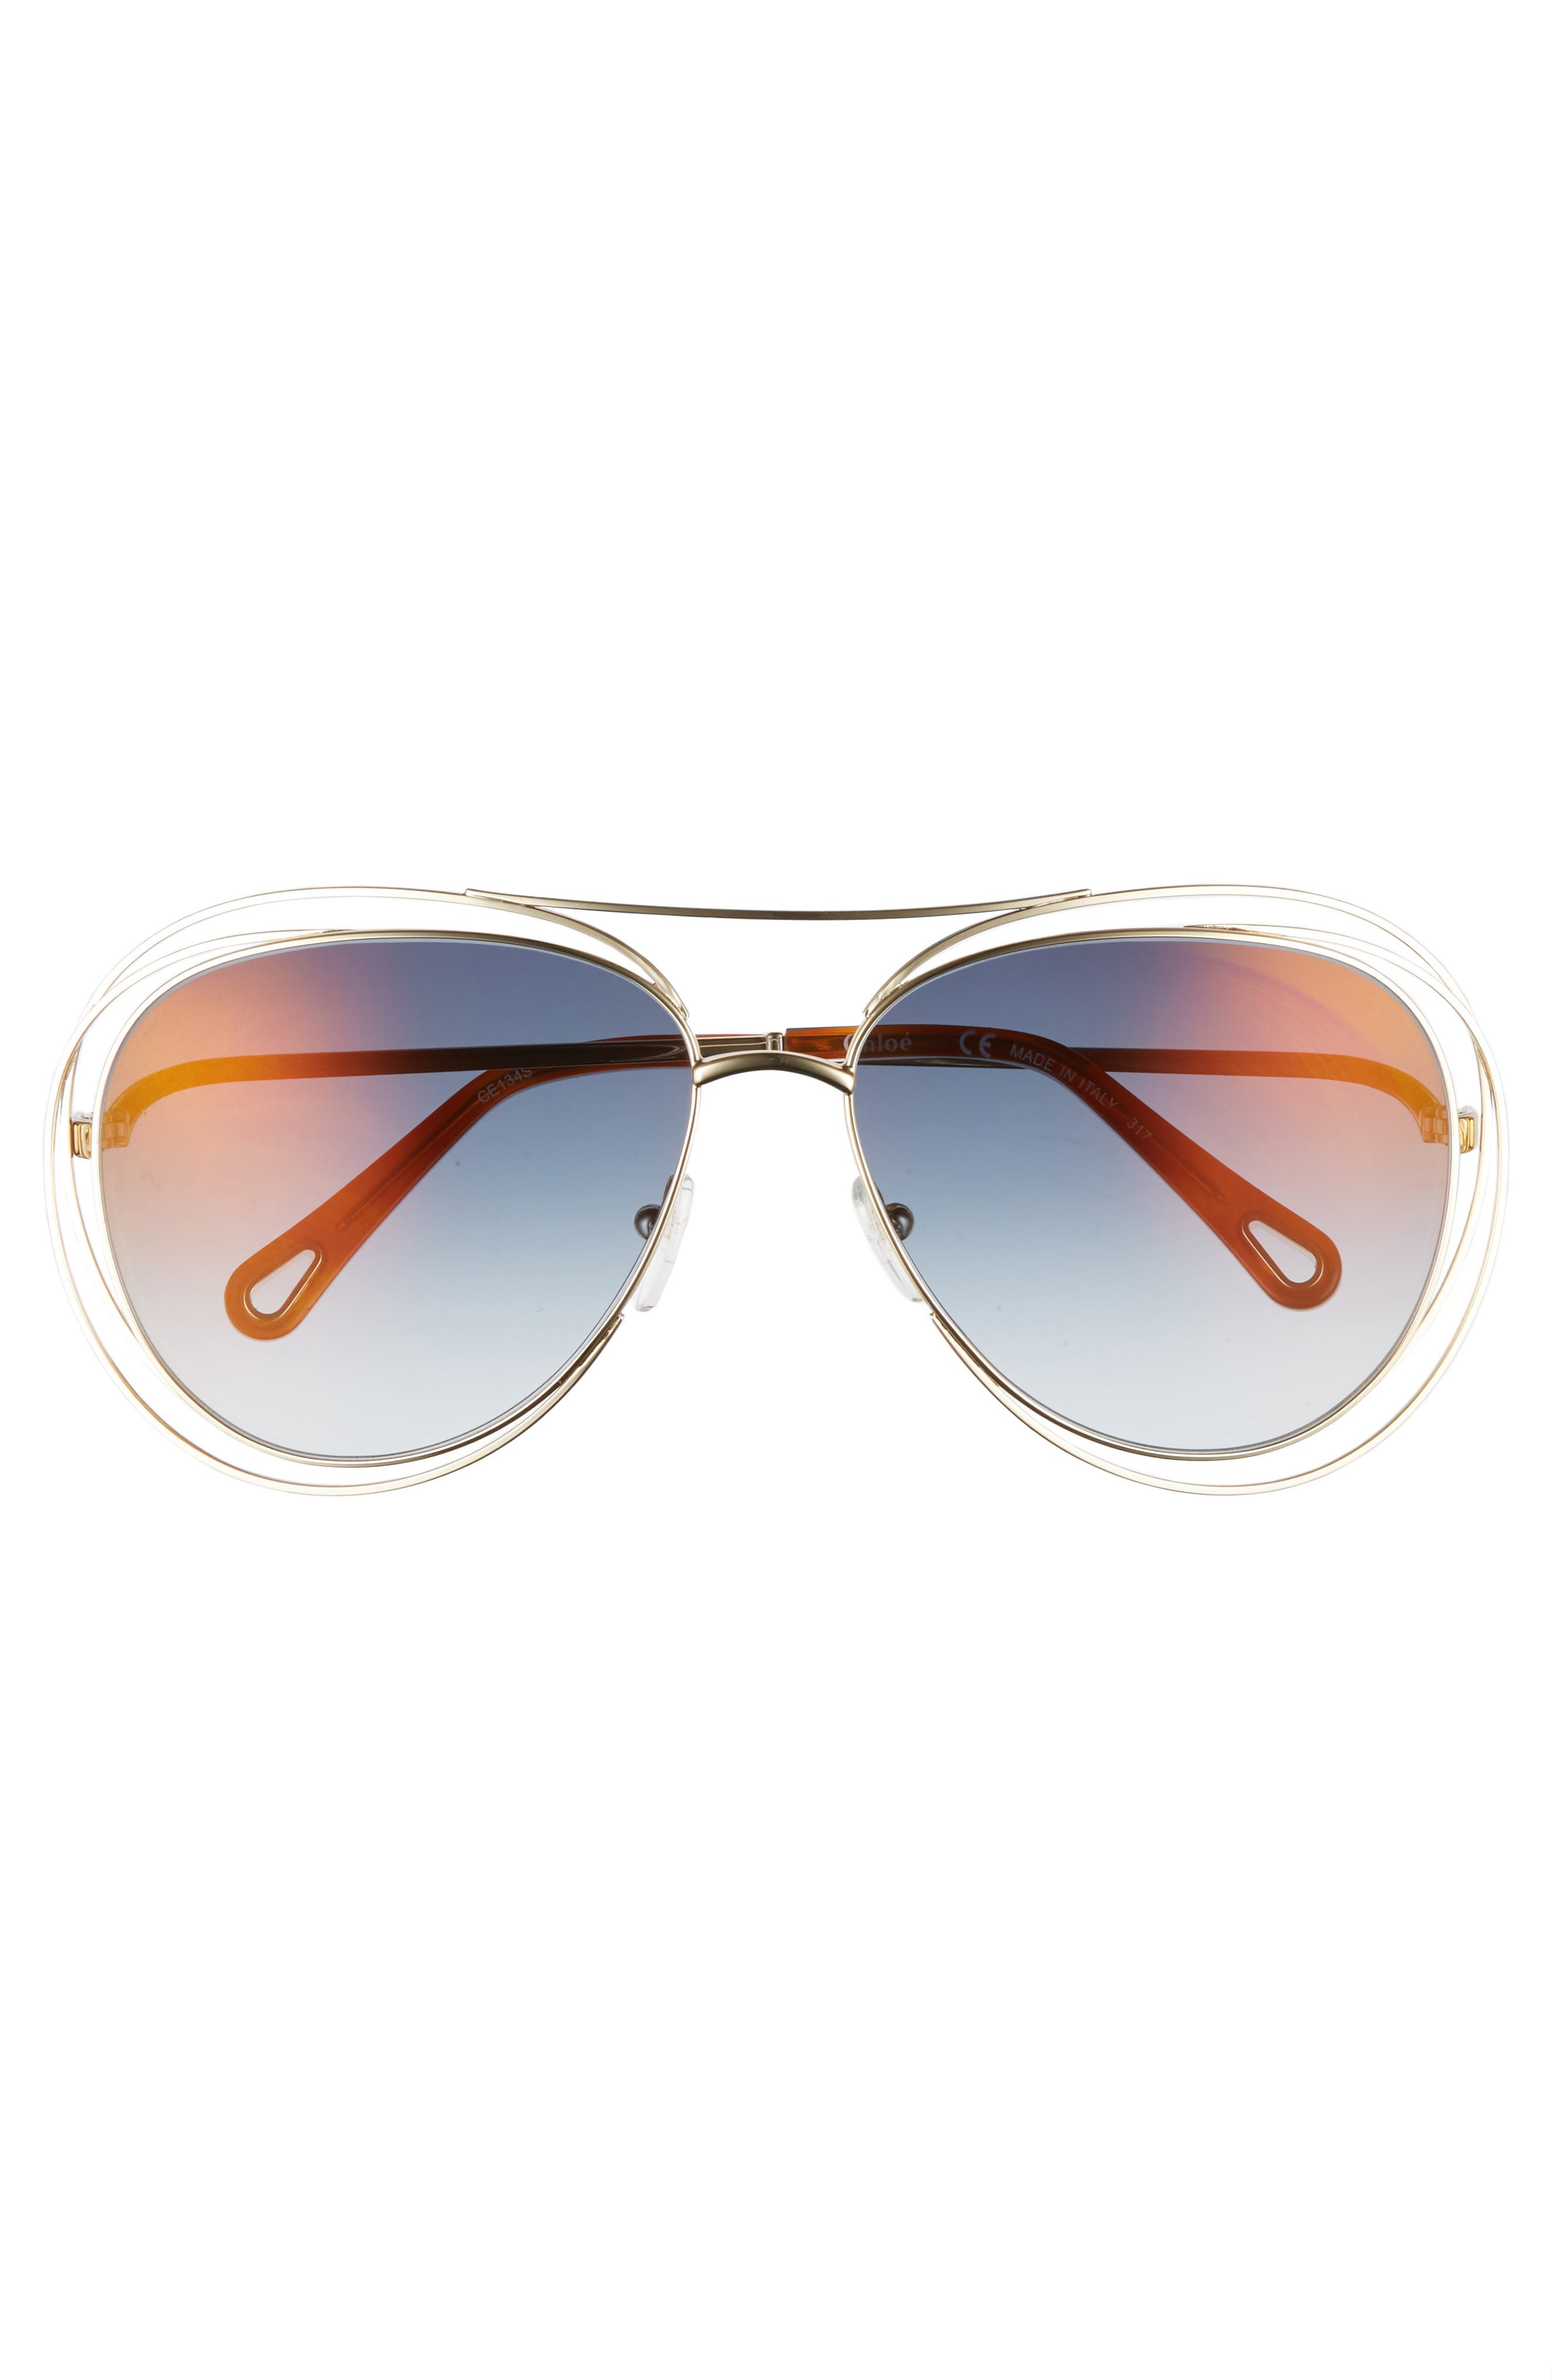 CHLOÉ, 61mm Aviator Sunglasses, Alternate thumbnail 3, color, GOLD/ HAVANA/ FLASH BLUE